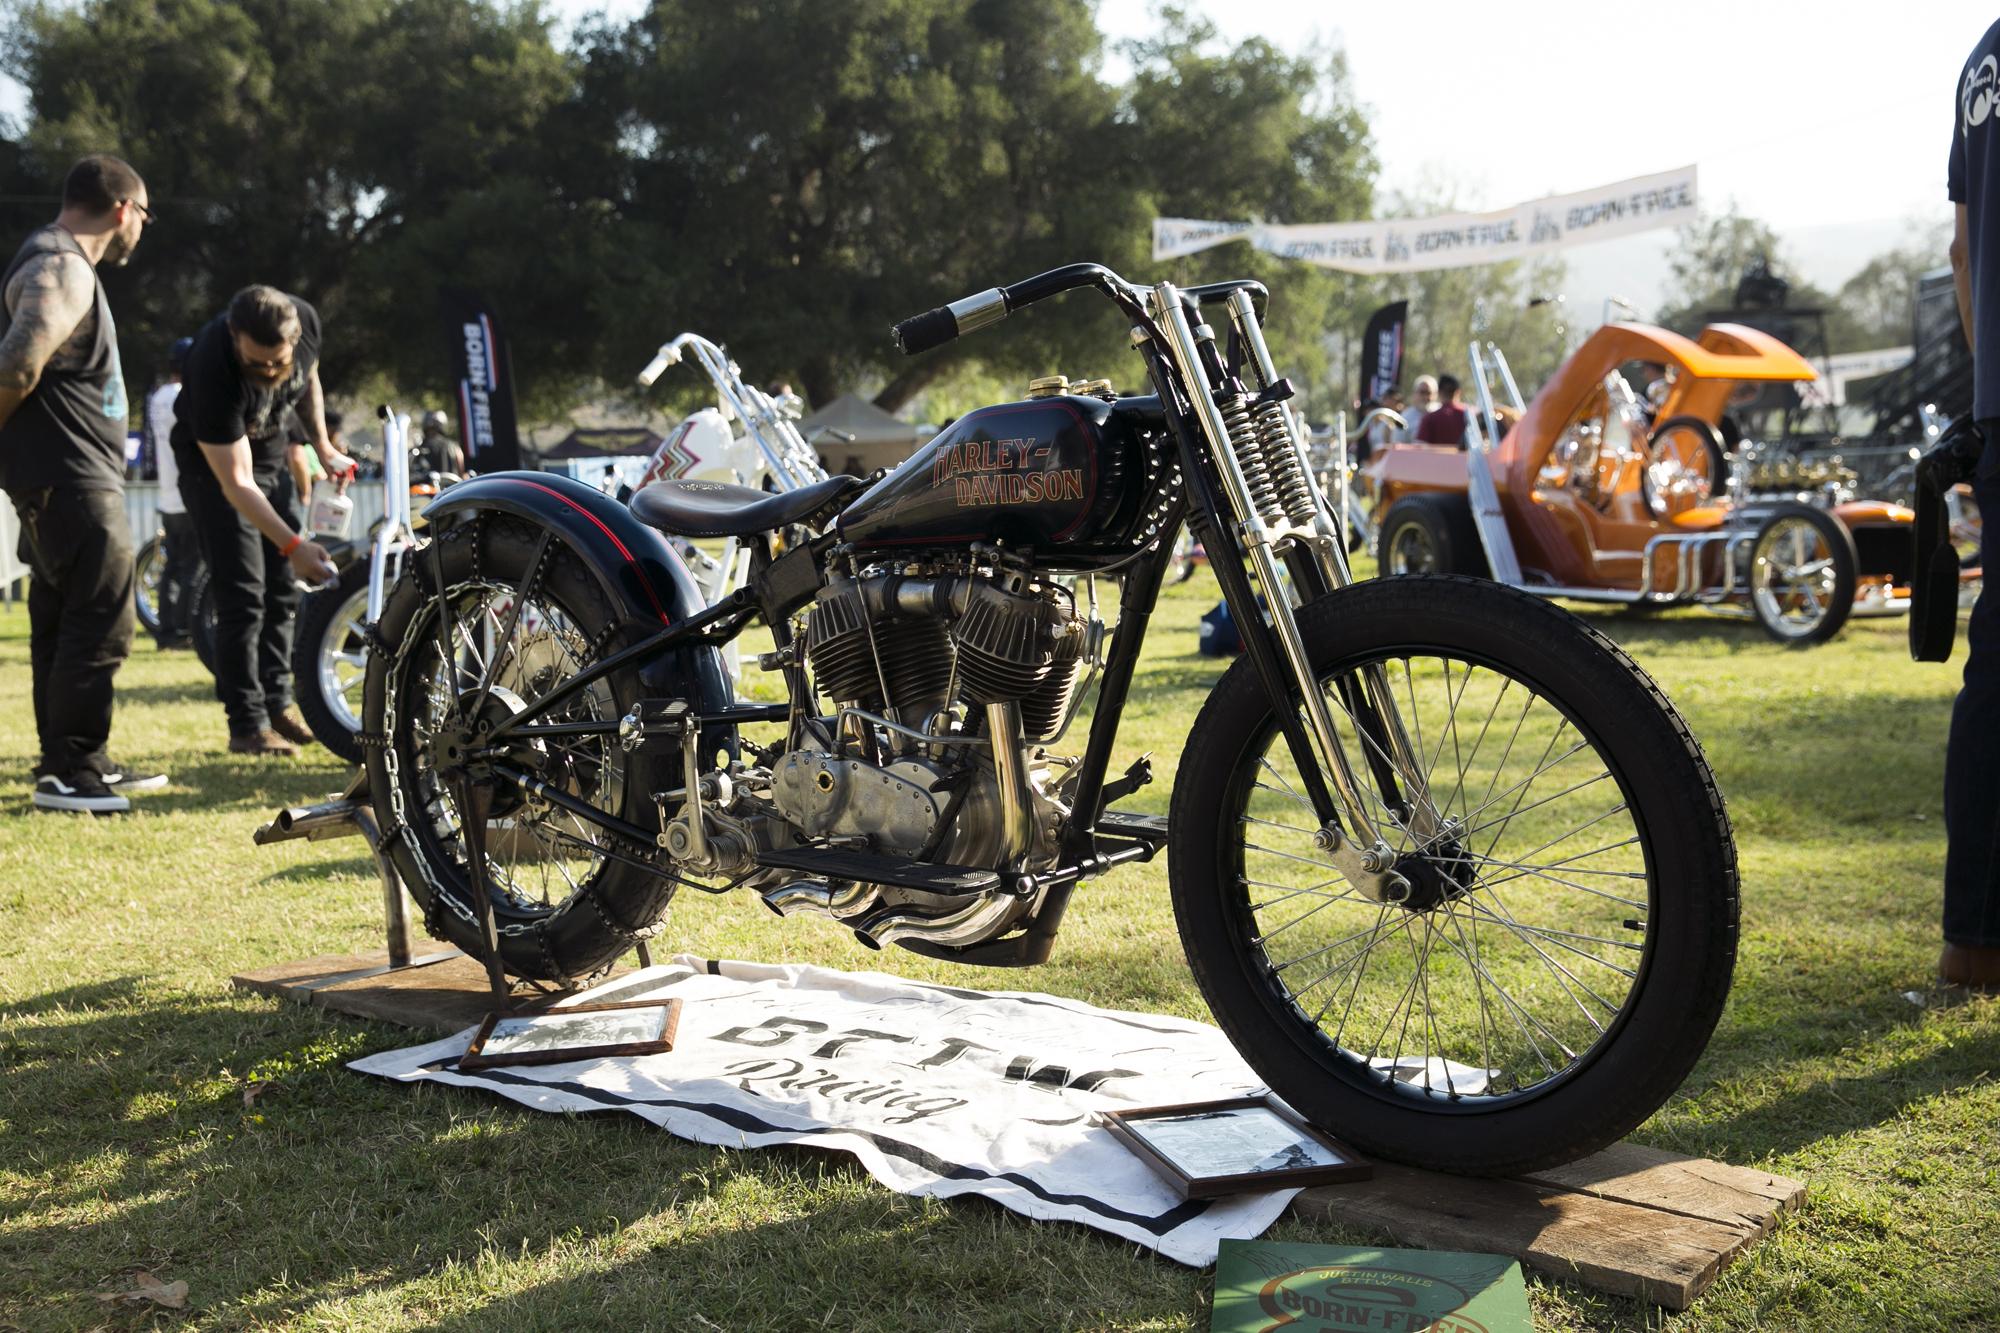 Born Free 8 Motorcycle Show-071.jpg